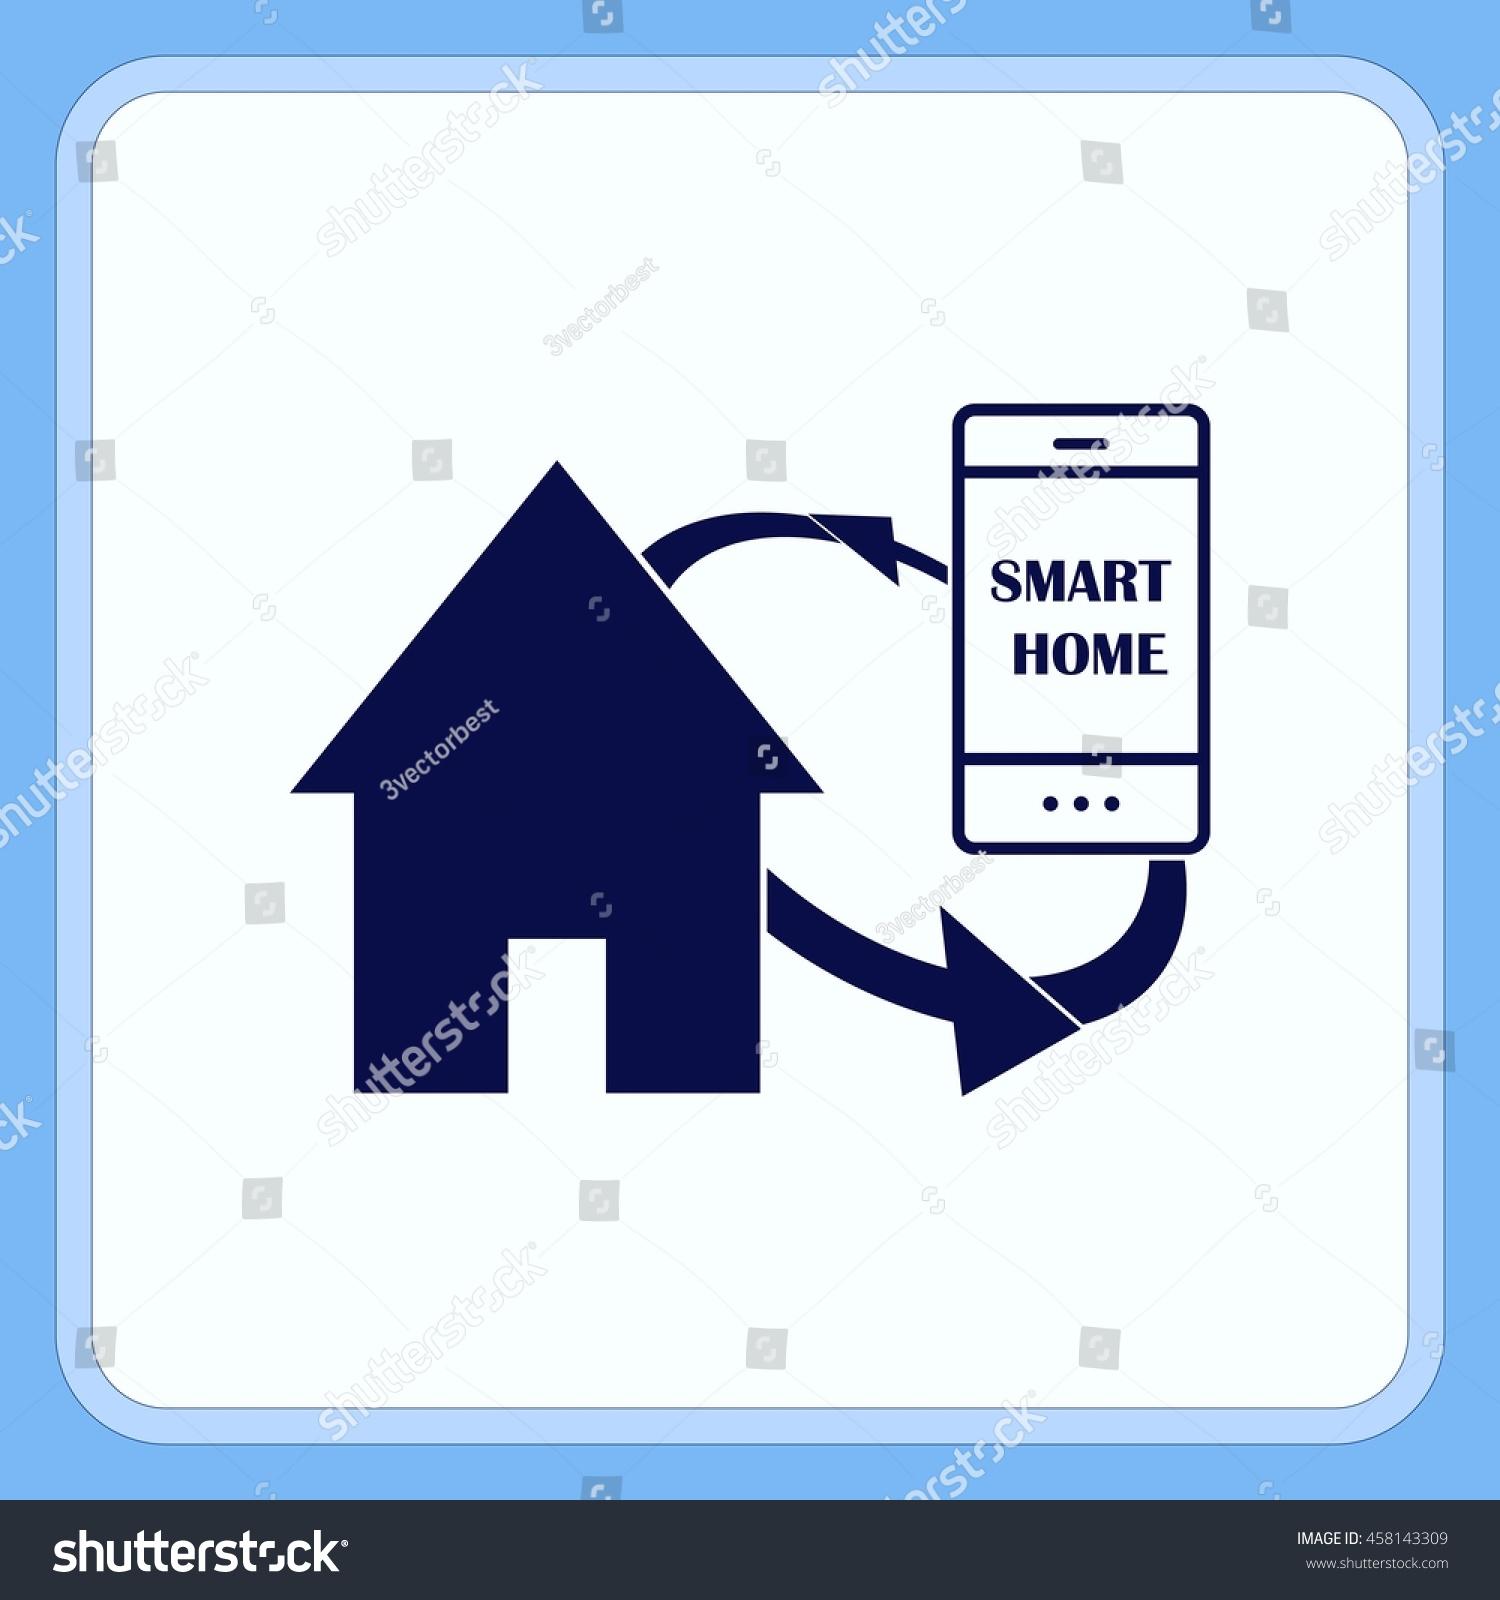 smart home cloud concept symbol vector stock vector 458143309 shutterstock. Black Bedroom Furniture Sets. Home Design Ideas